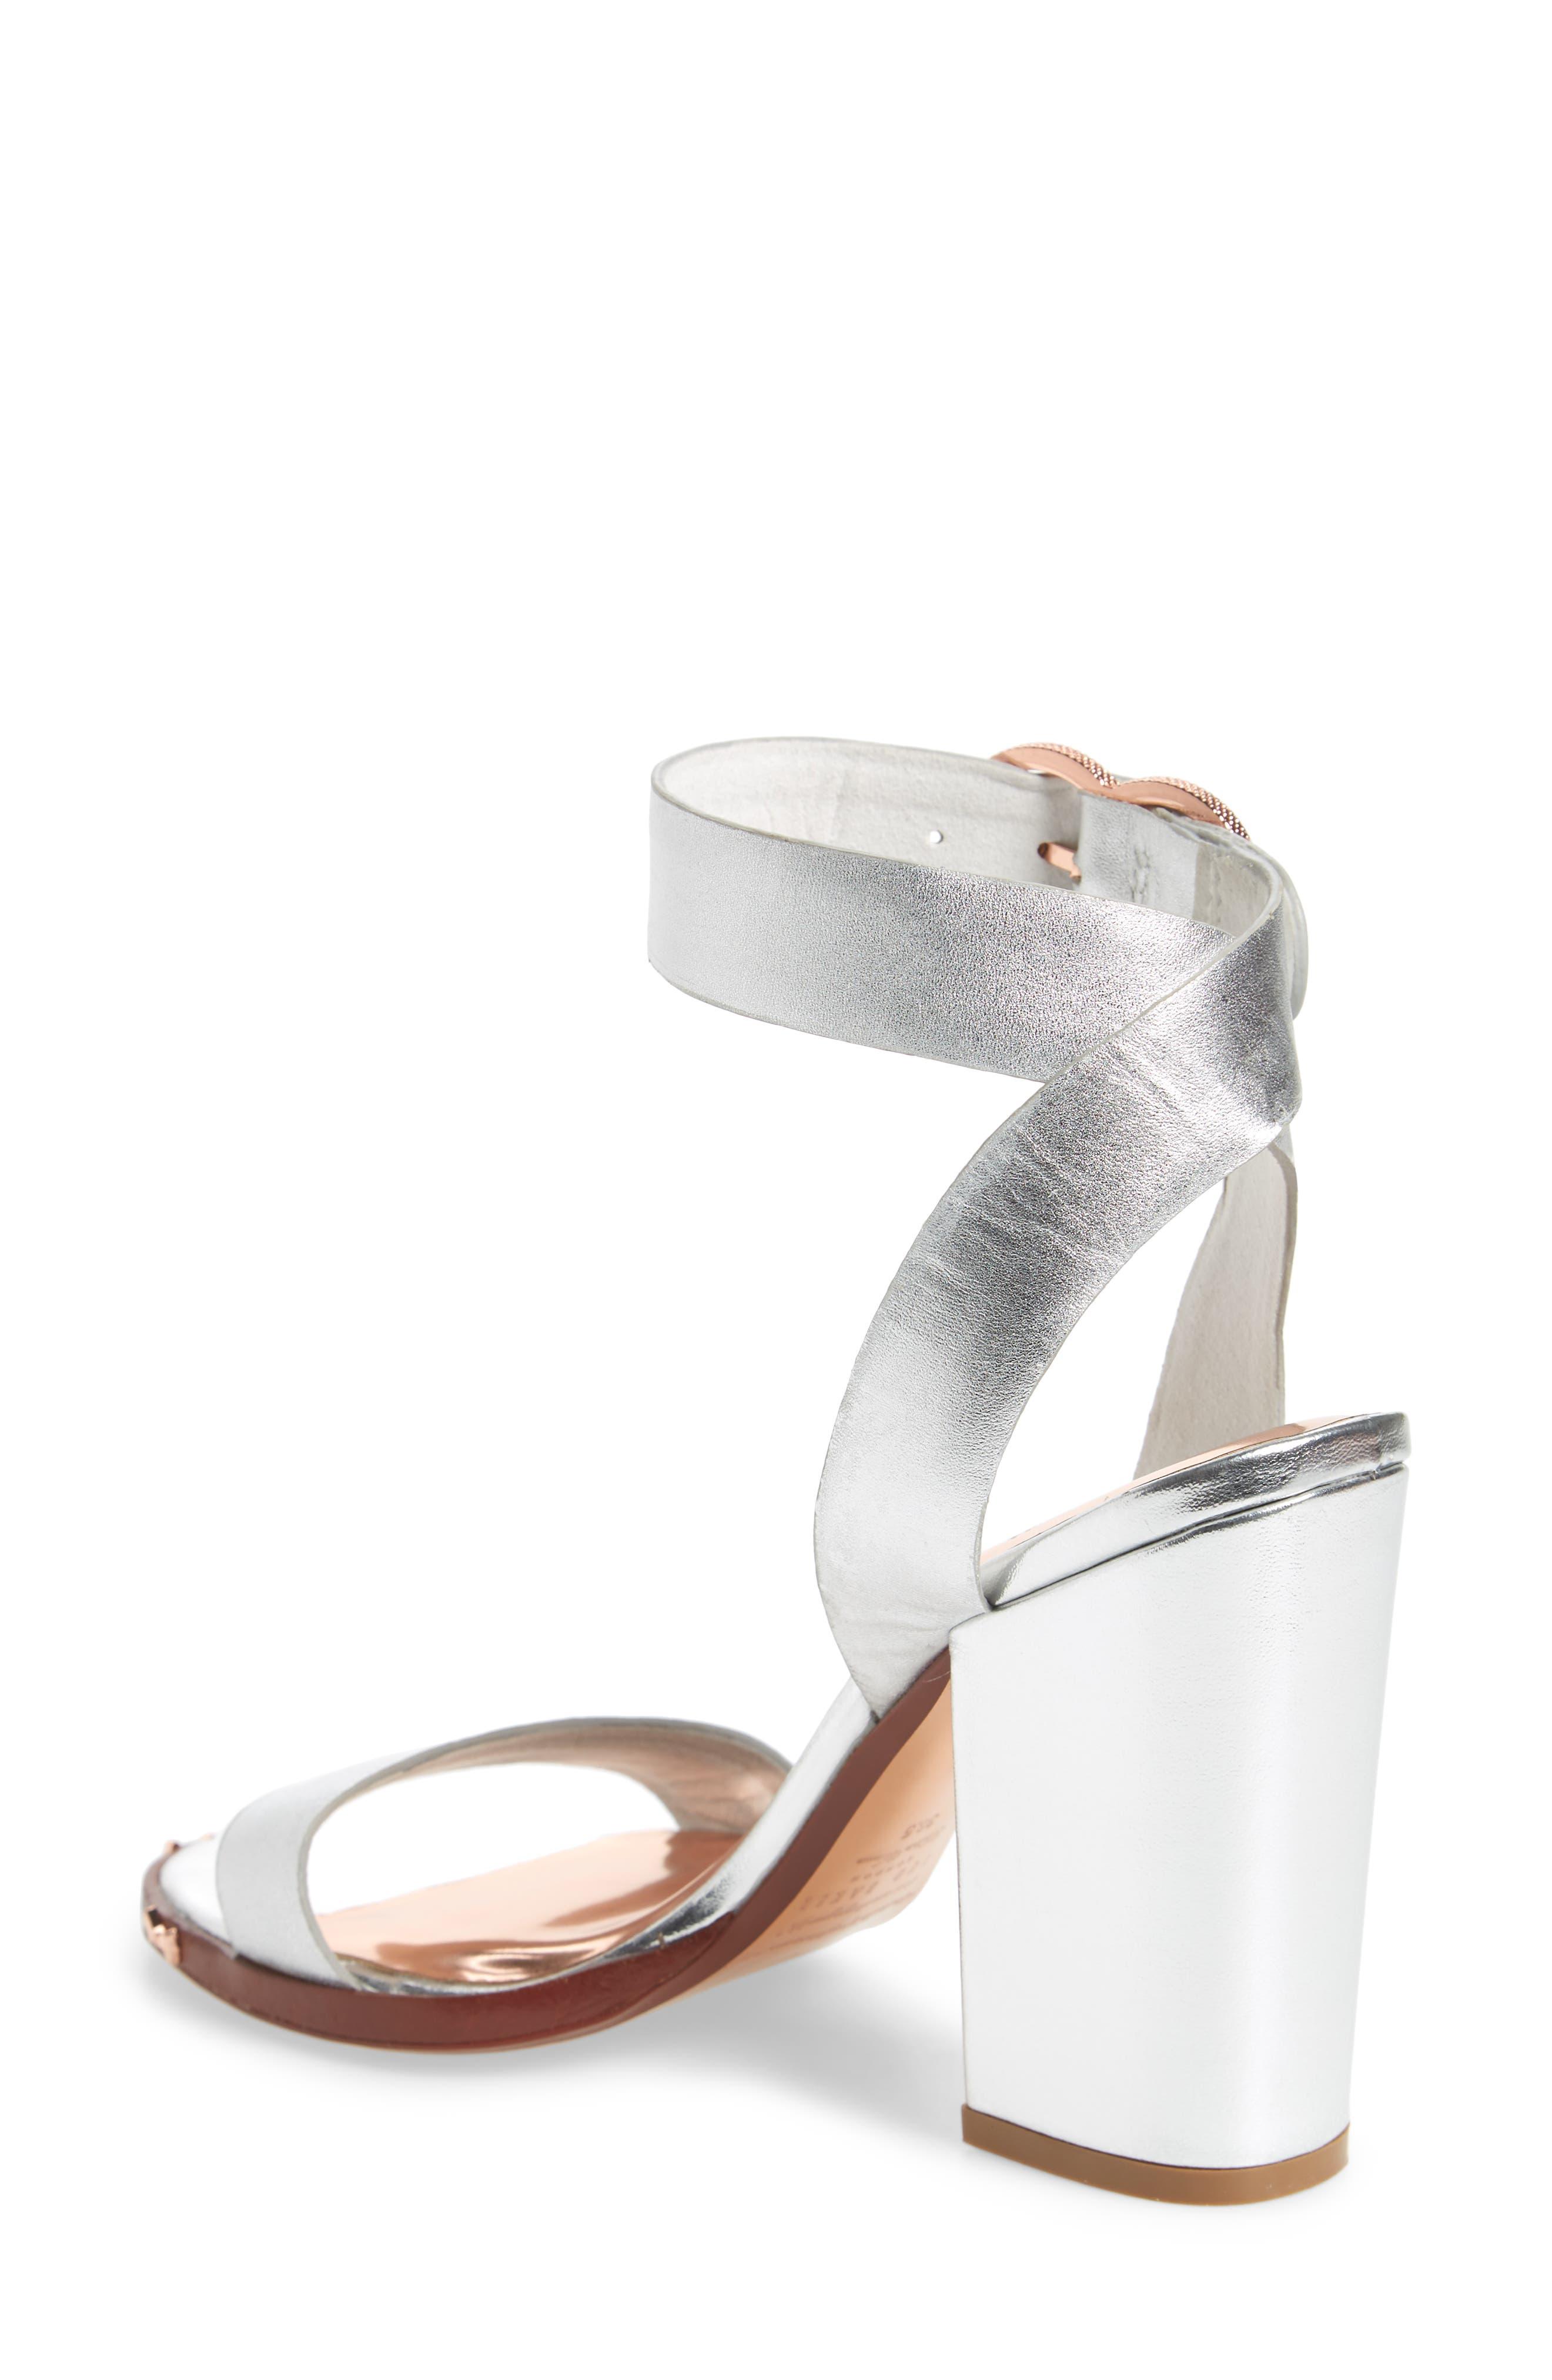 Lylea Block Heel Sandal,                             Alternate thumbnail 2, color,                             Silver Leather